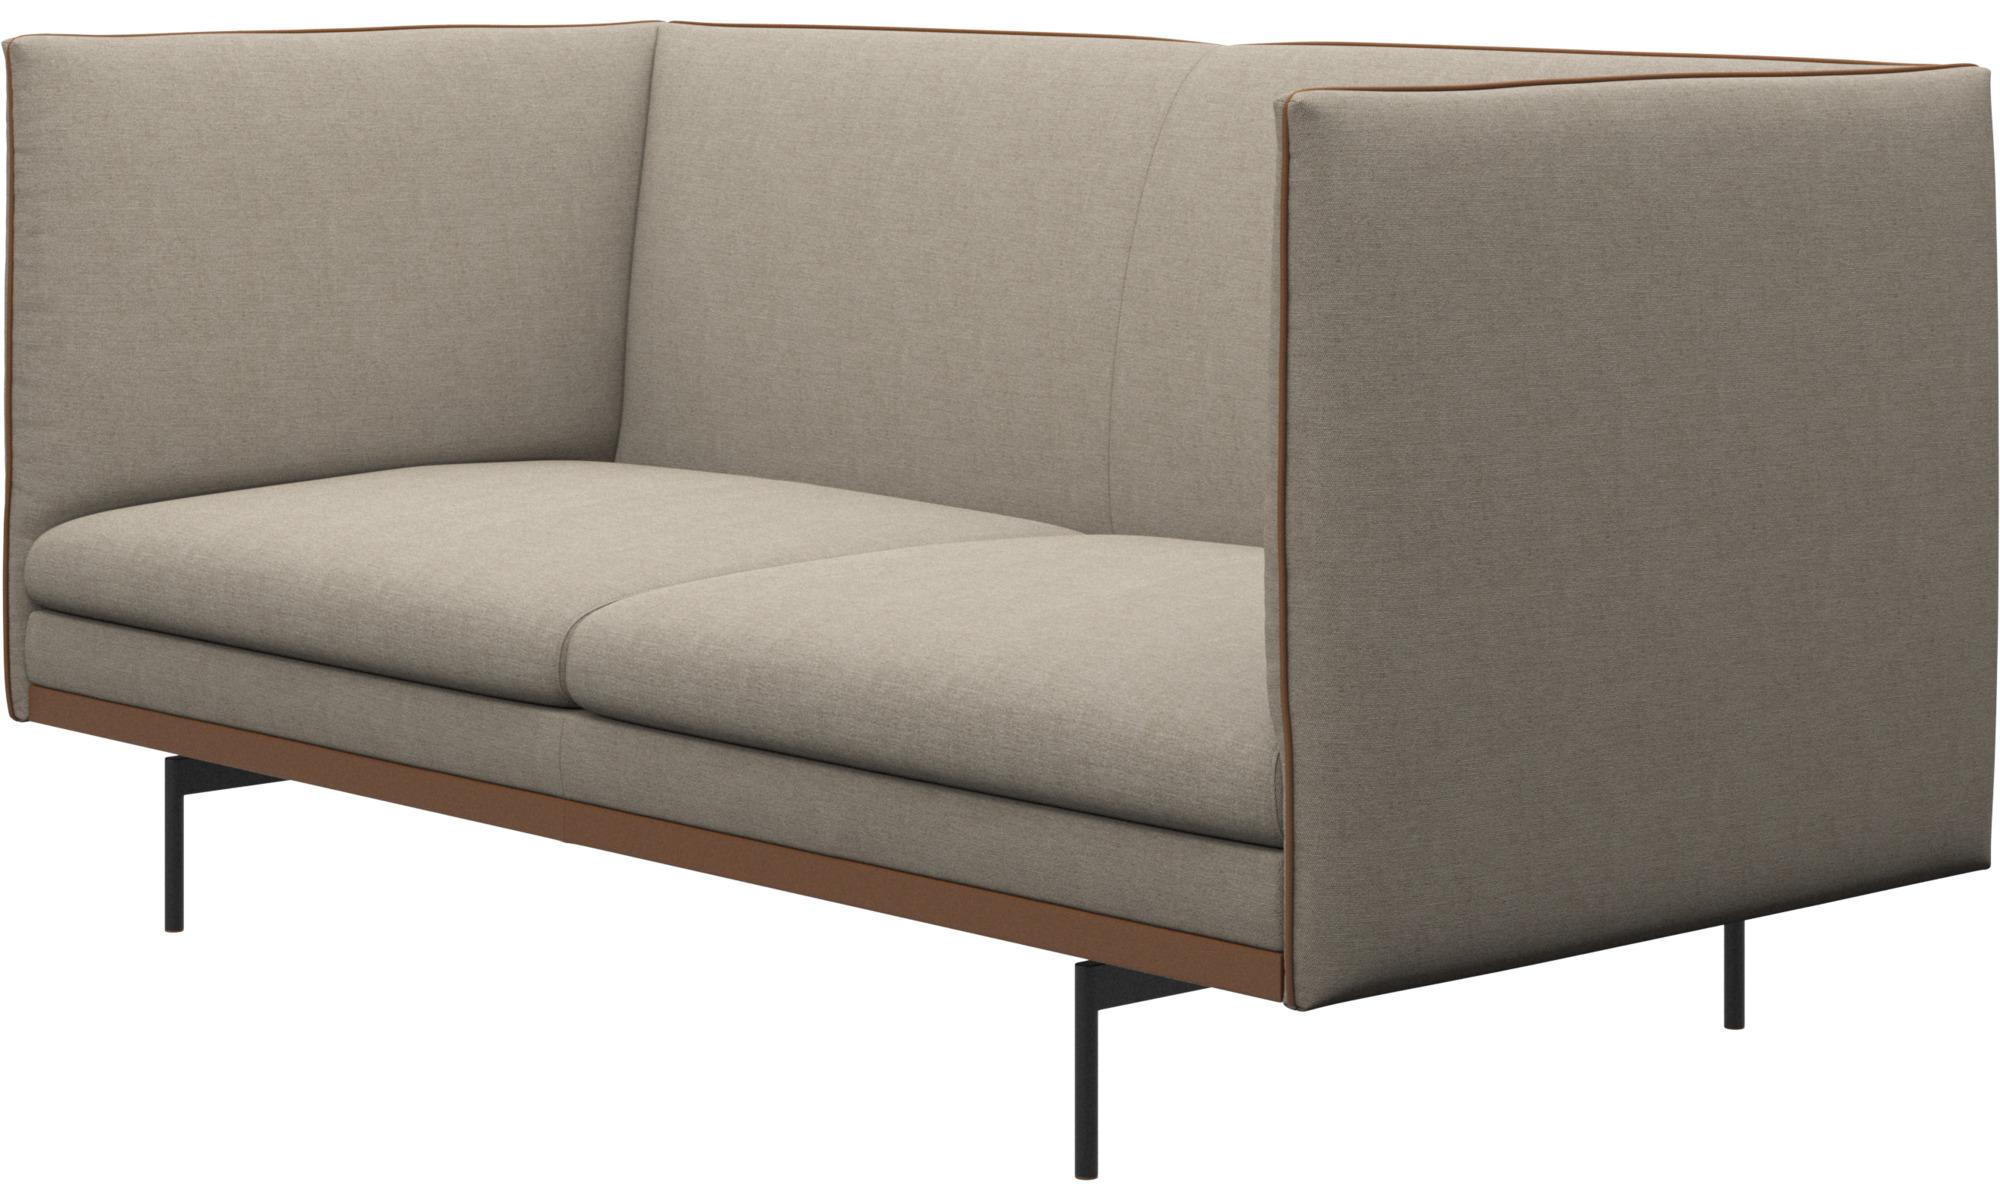 Incredible 2 Seater Sofas Divano Nantes Con Cuscini Boconcept Forskolin Free Trial Chair Design Images Forskolin Free Trialorg